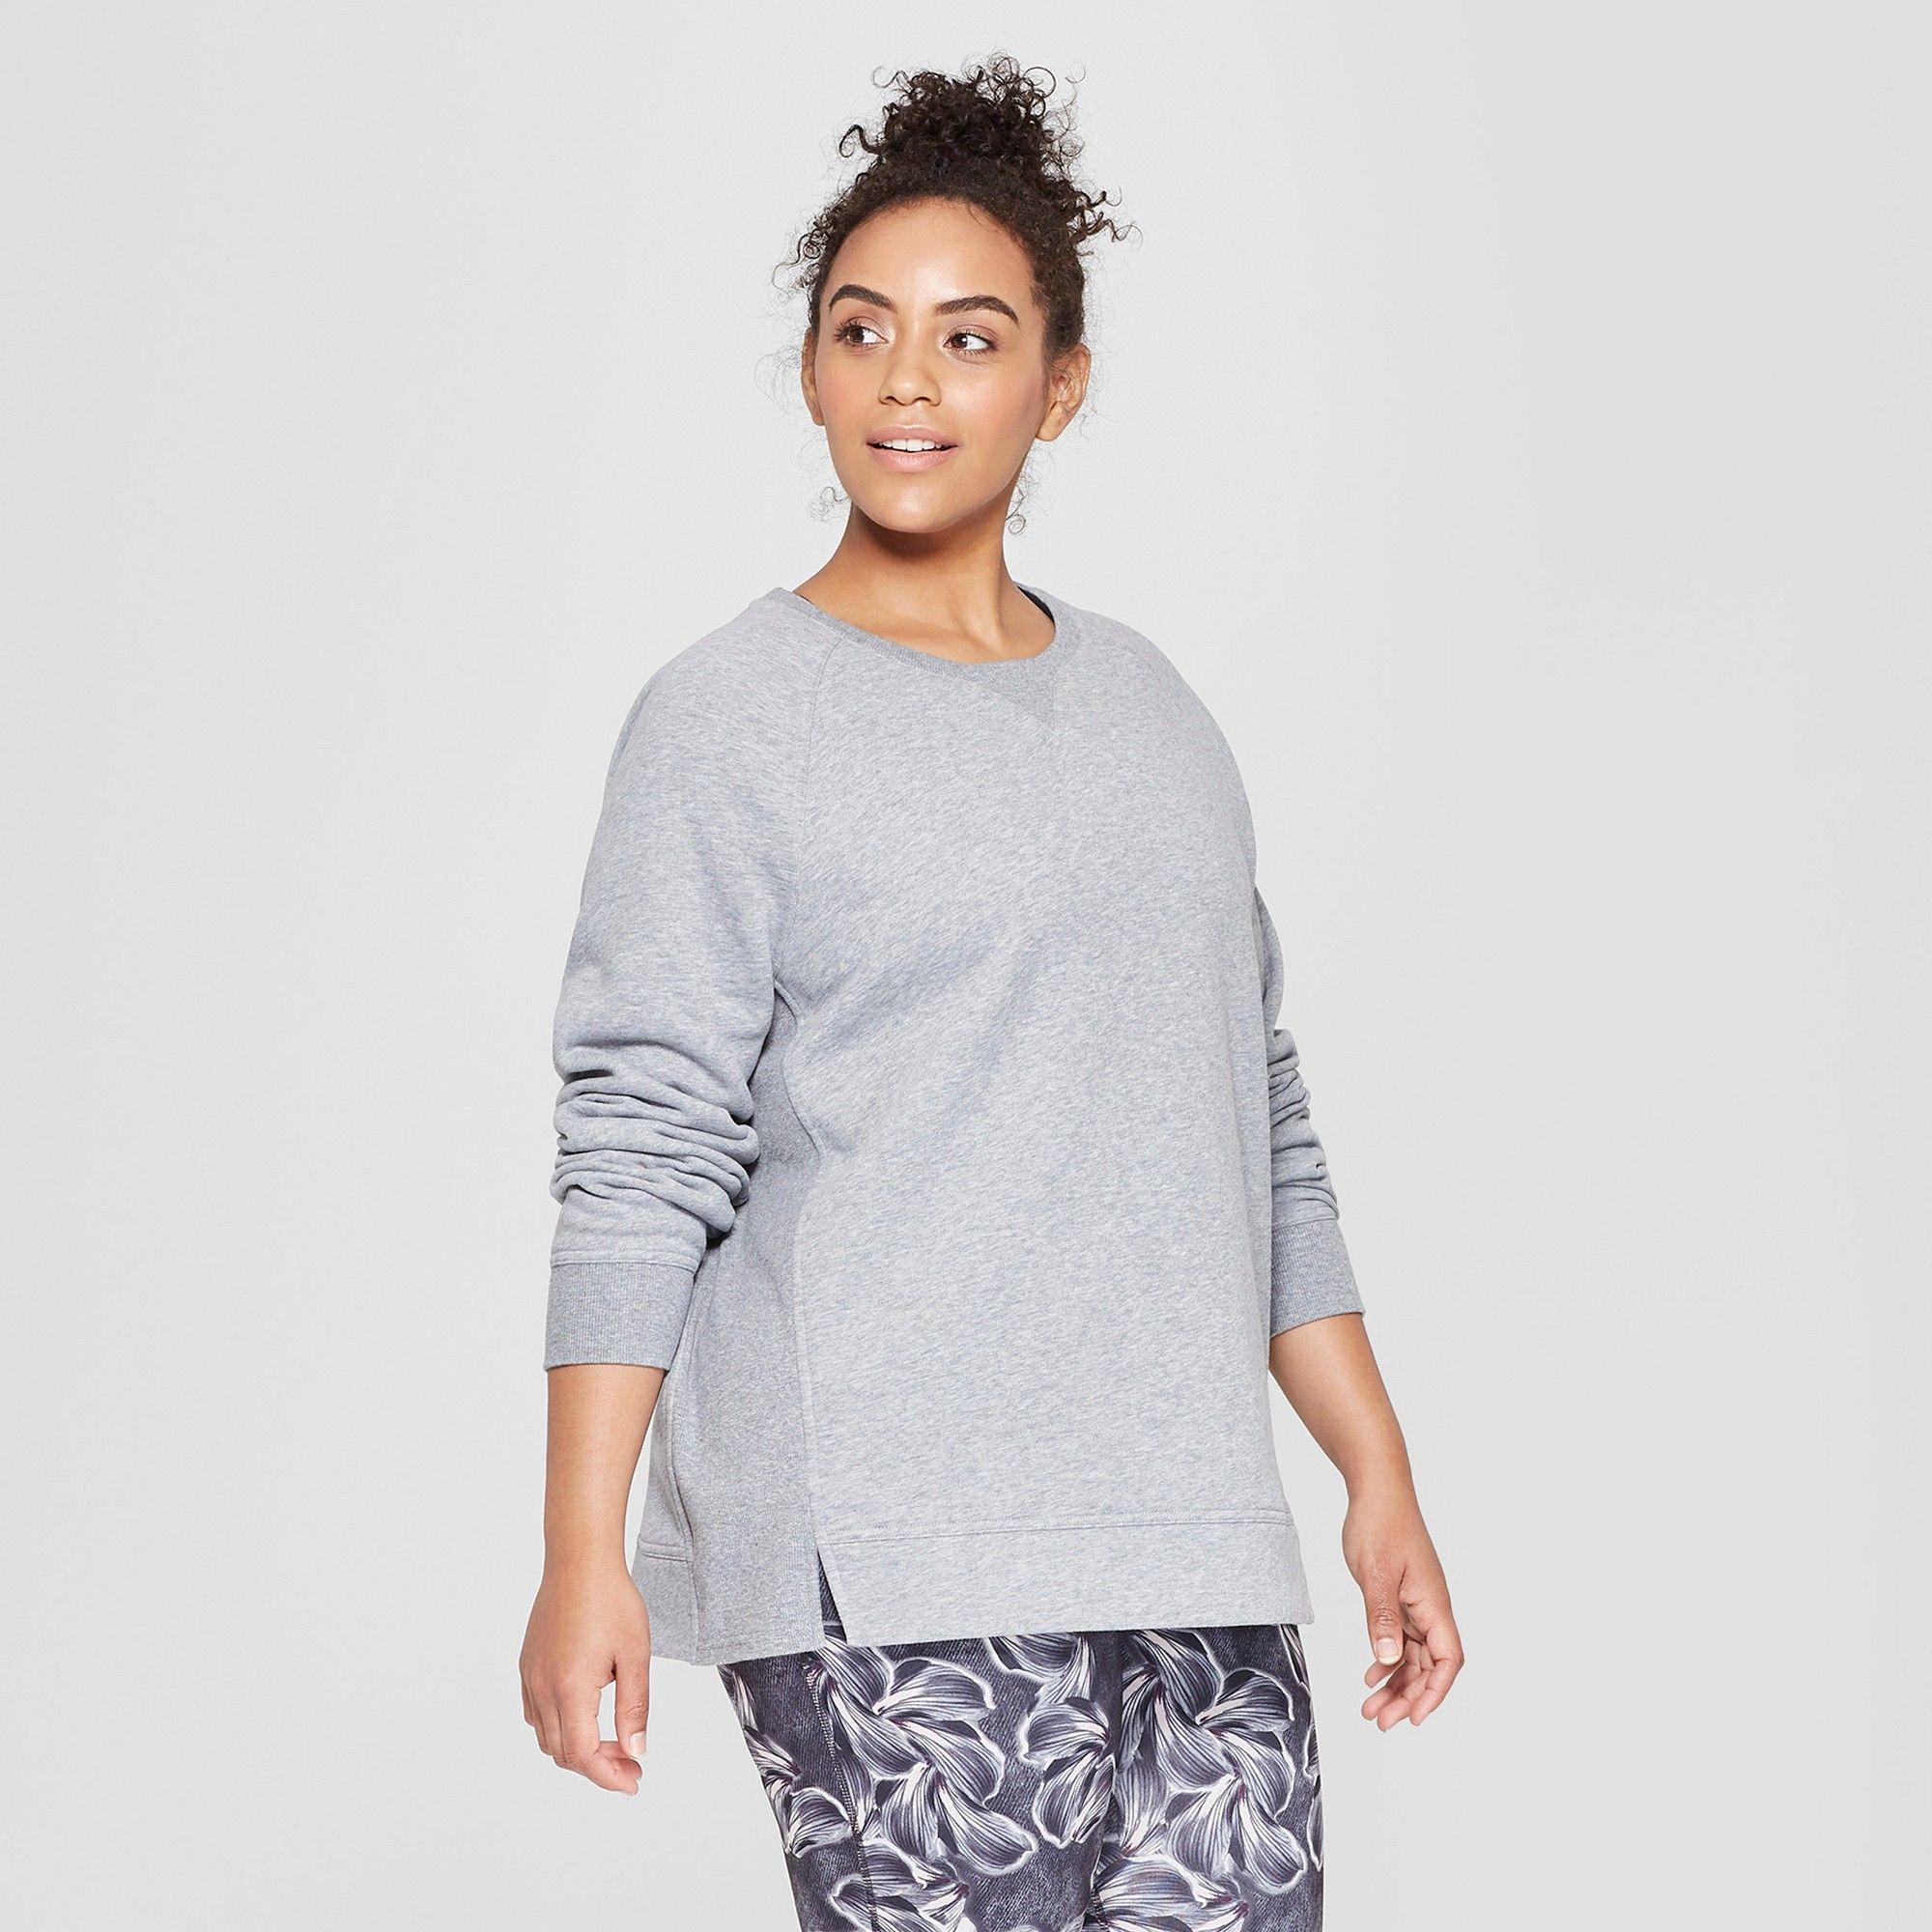 206e18caa54d3 Women s Plus Size Authentic Fleece Sweatshirt - C9 Champion Heather Grey 2X